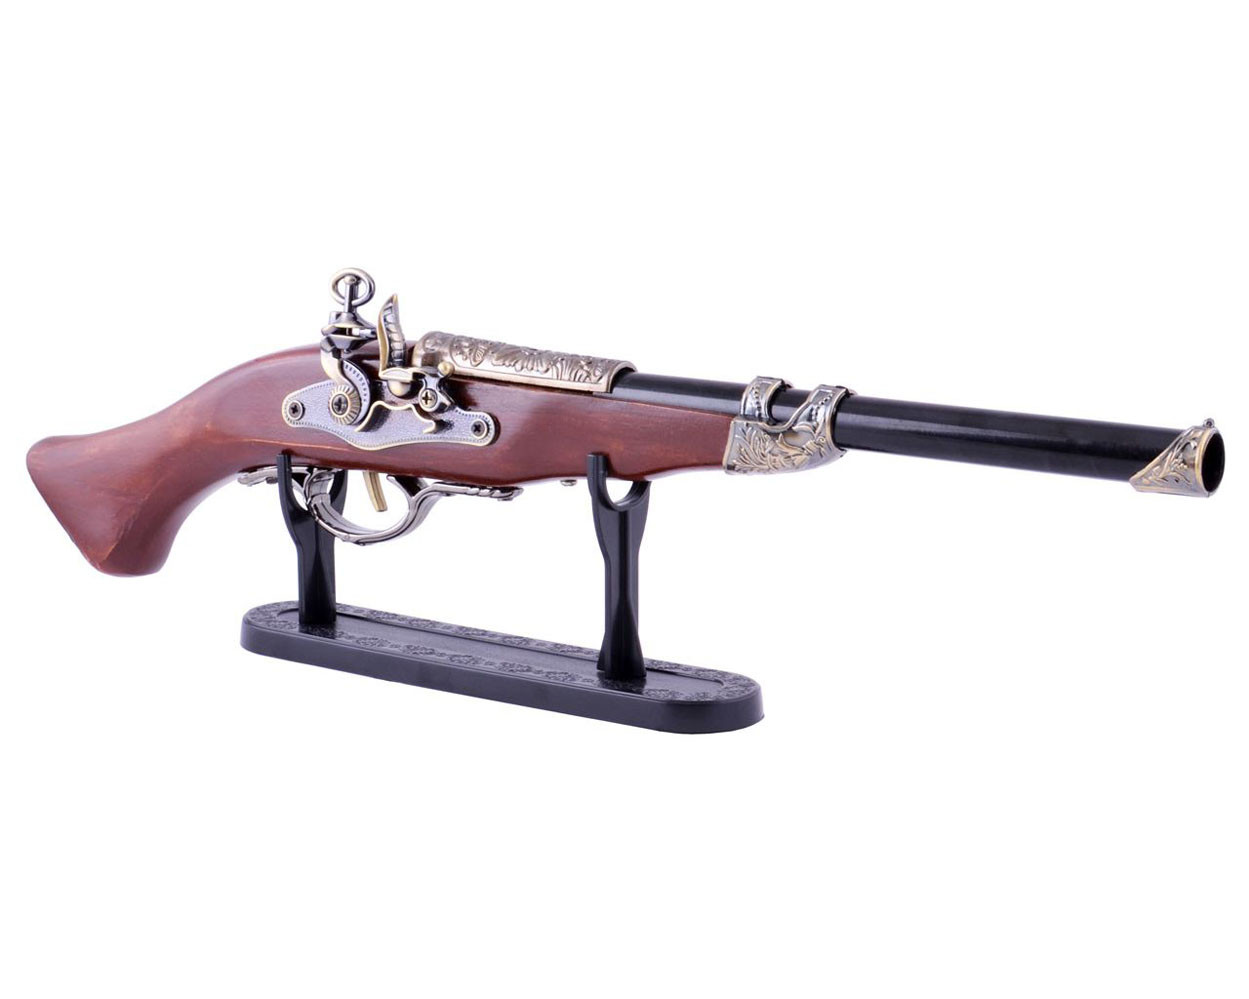 Сувенирная зажигалка мушкет 4419 на подставке